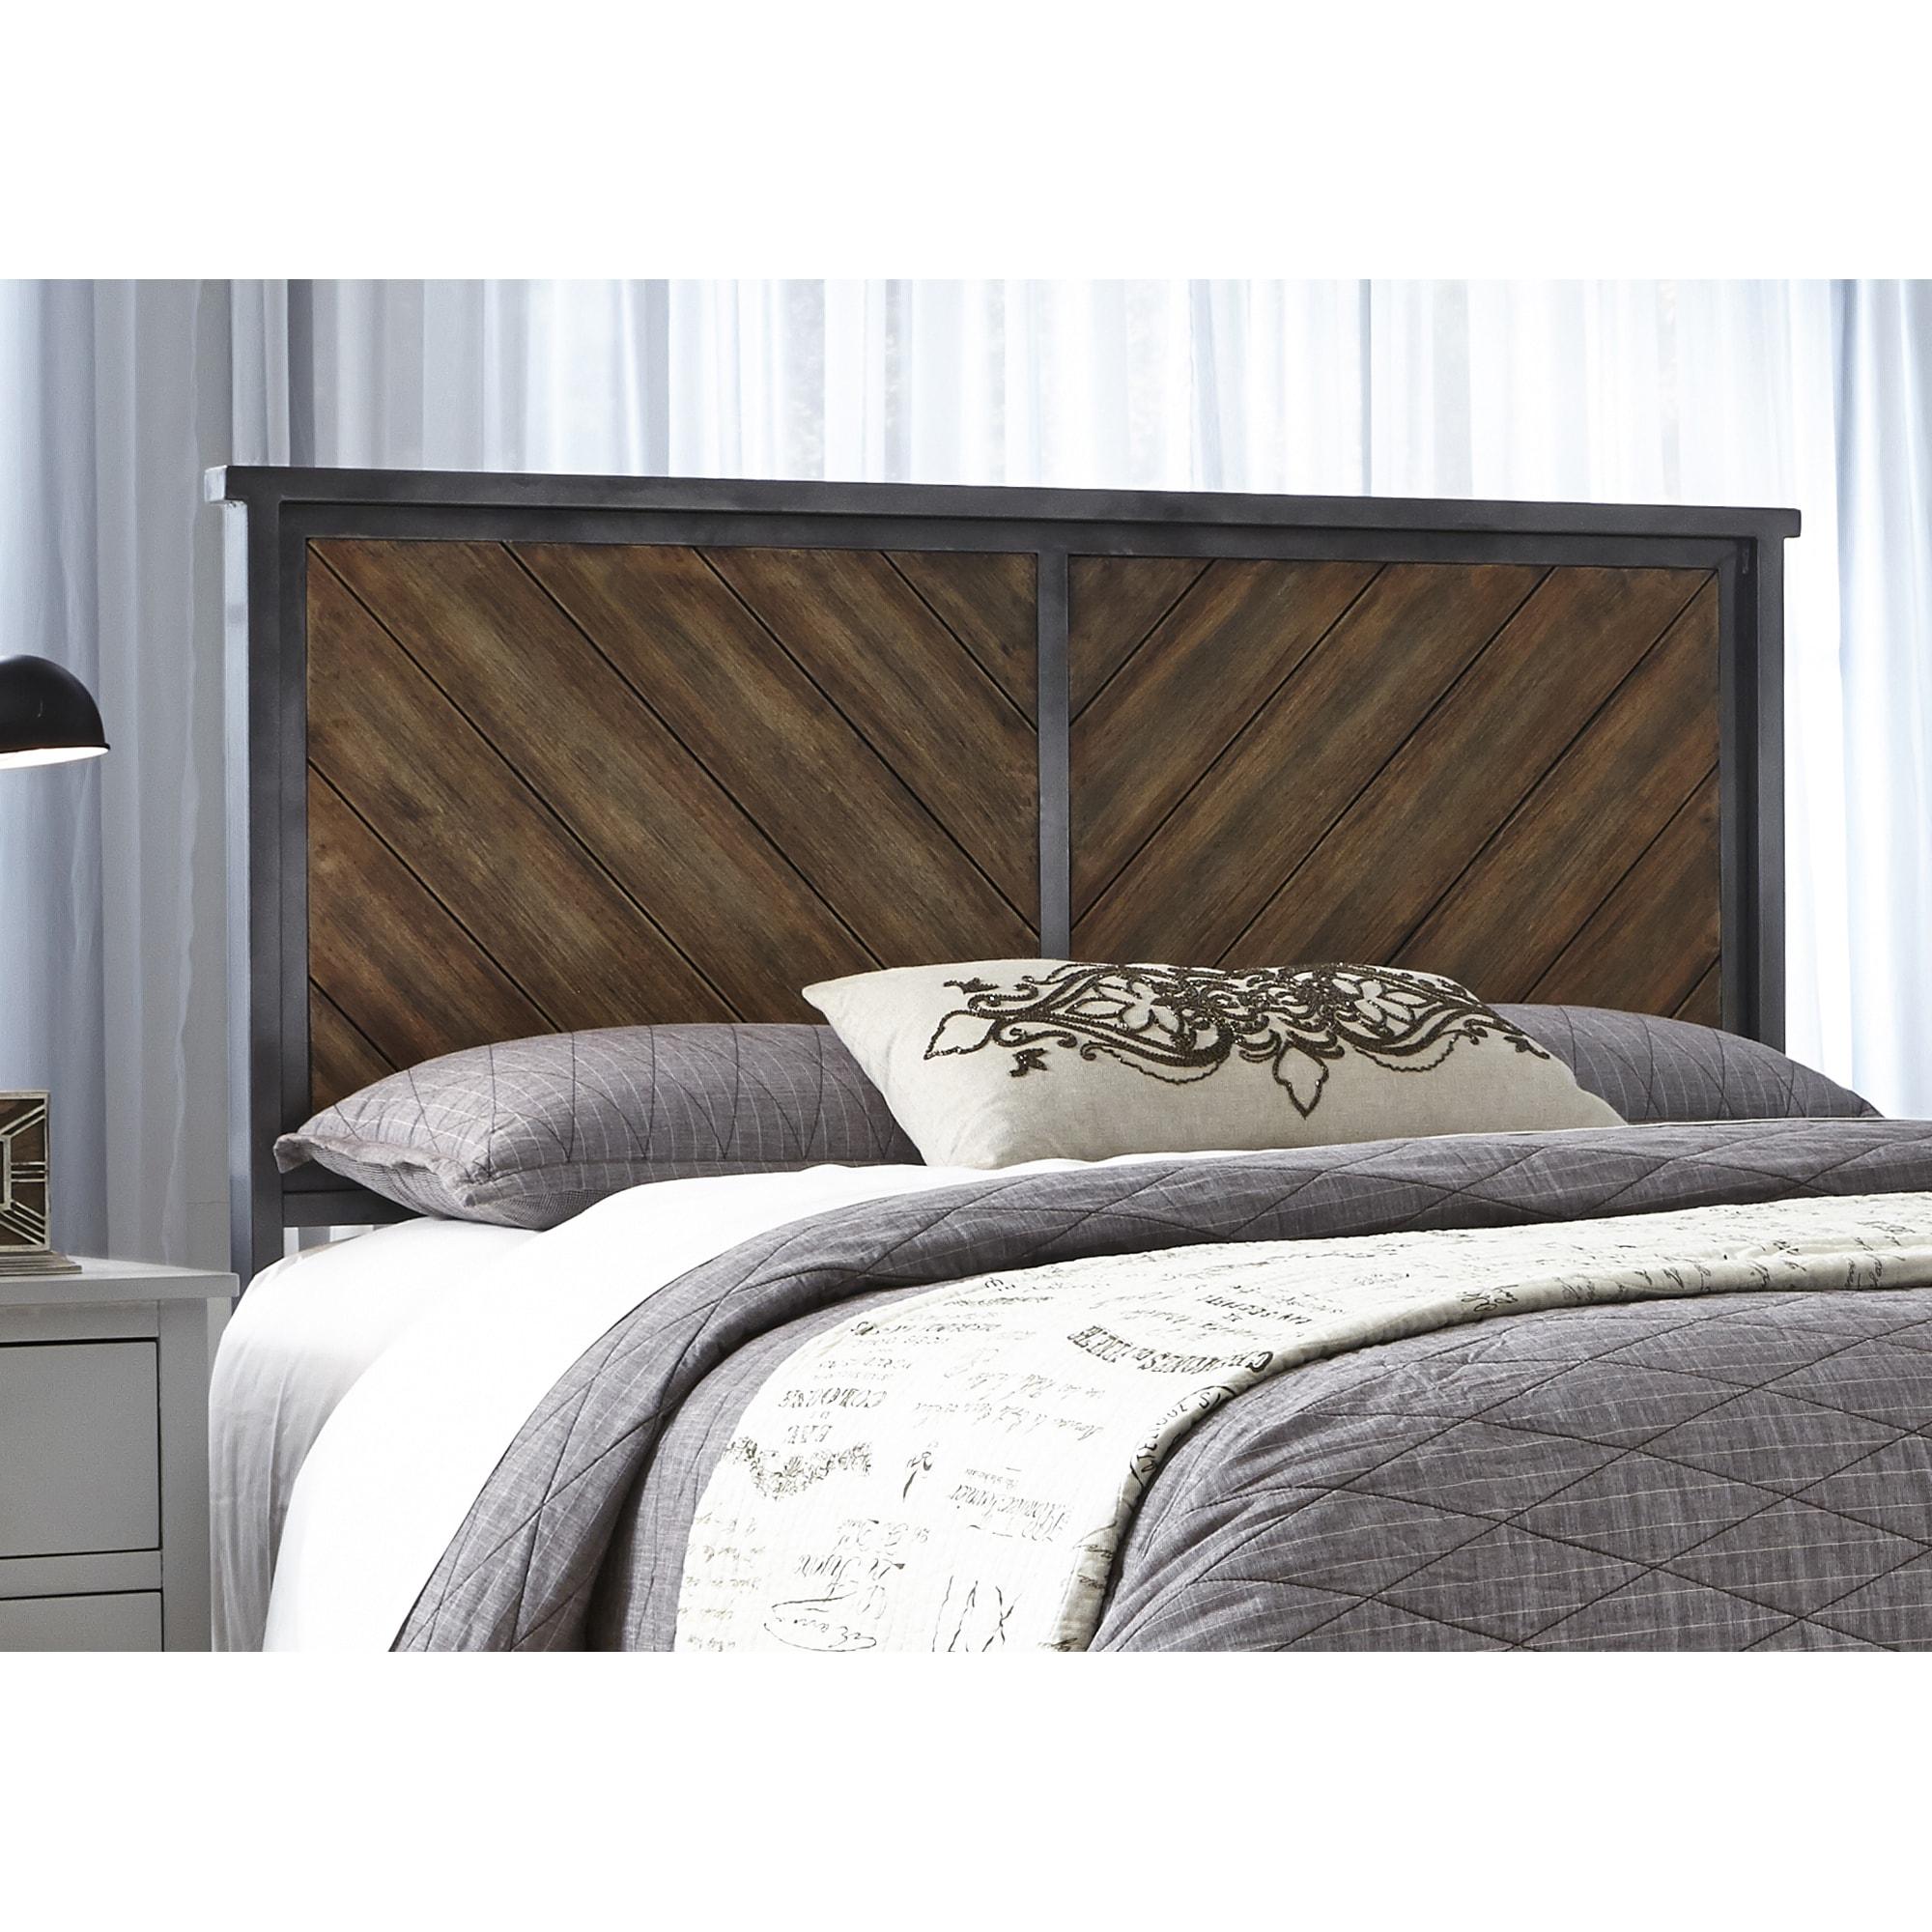 Fashion Bed Group Braden Metal Headboard Panel with Recla...